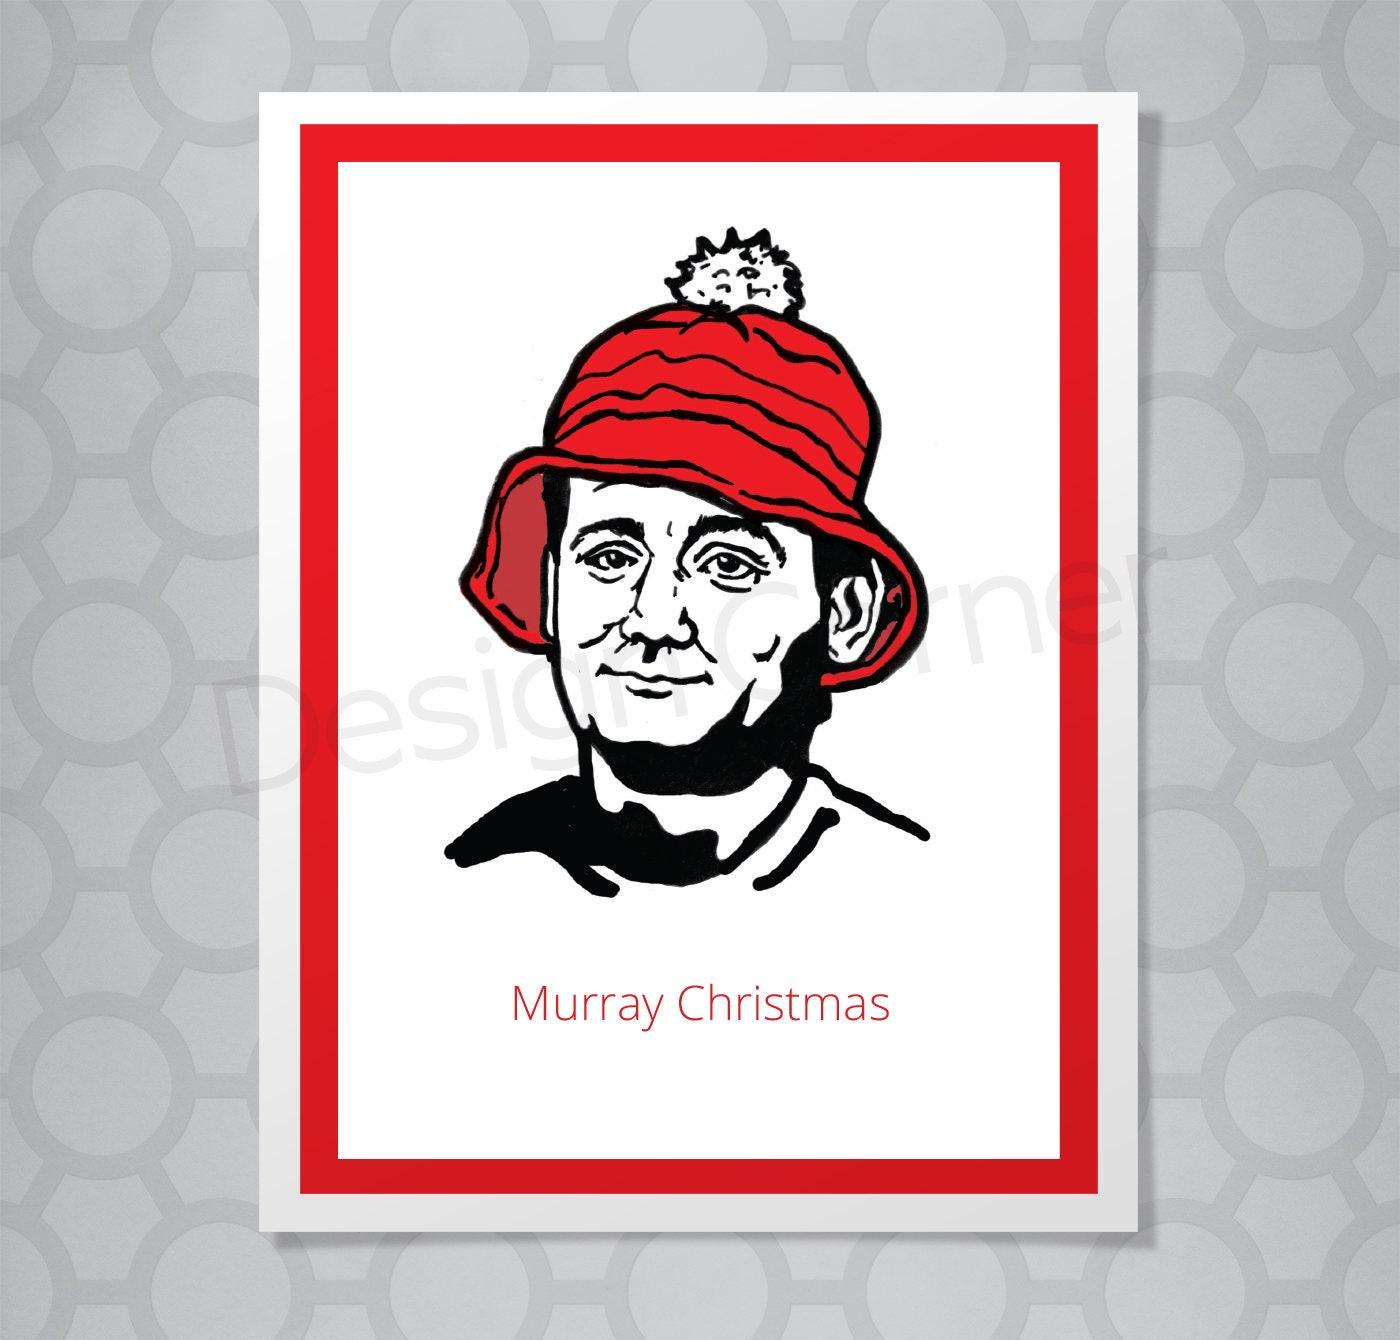 Bill Murray Funny Illustrated Christmas Card | Etsy